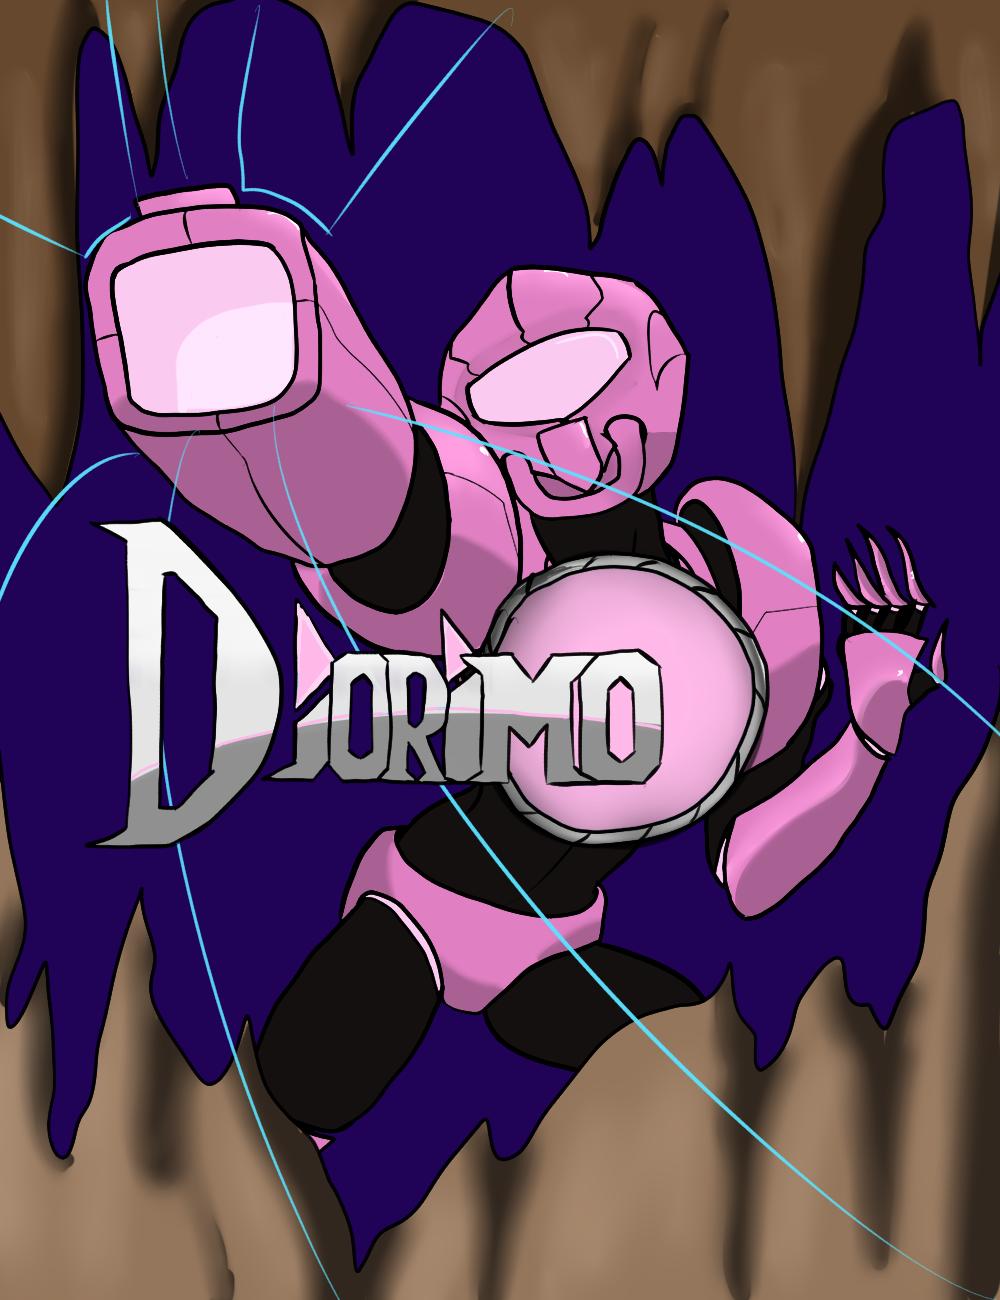 Diorimo